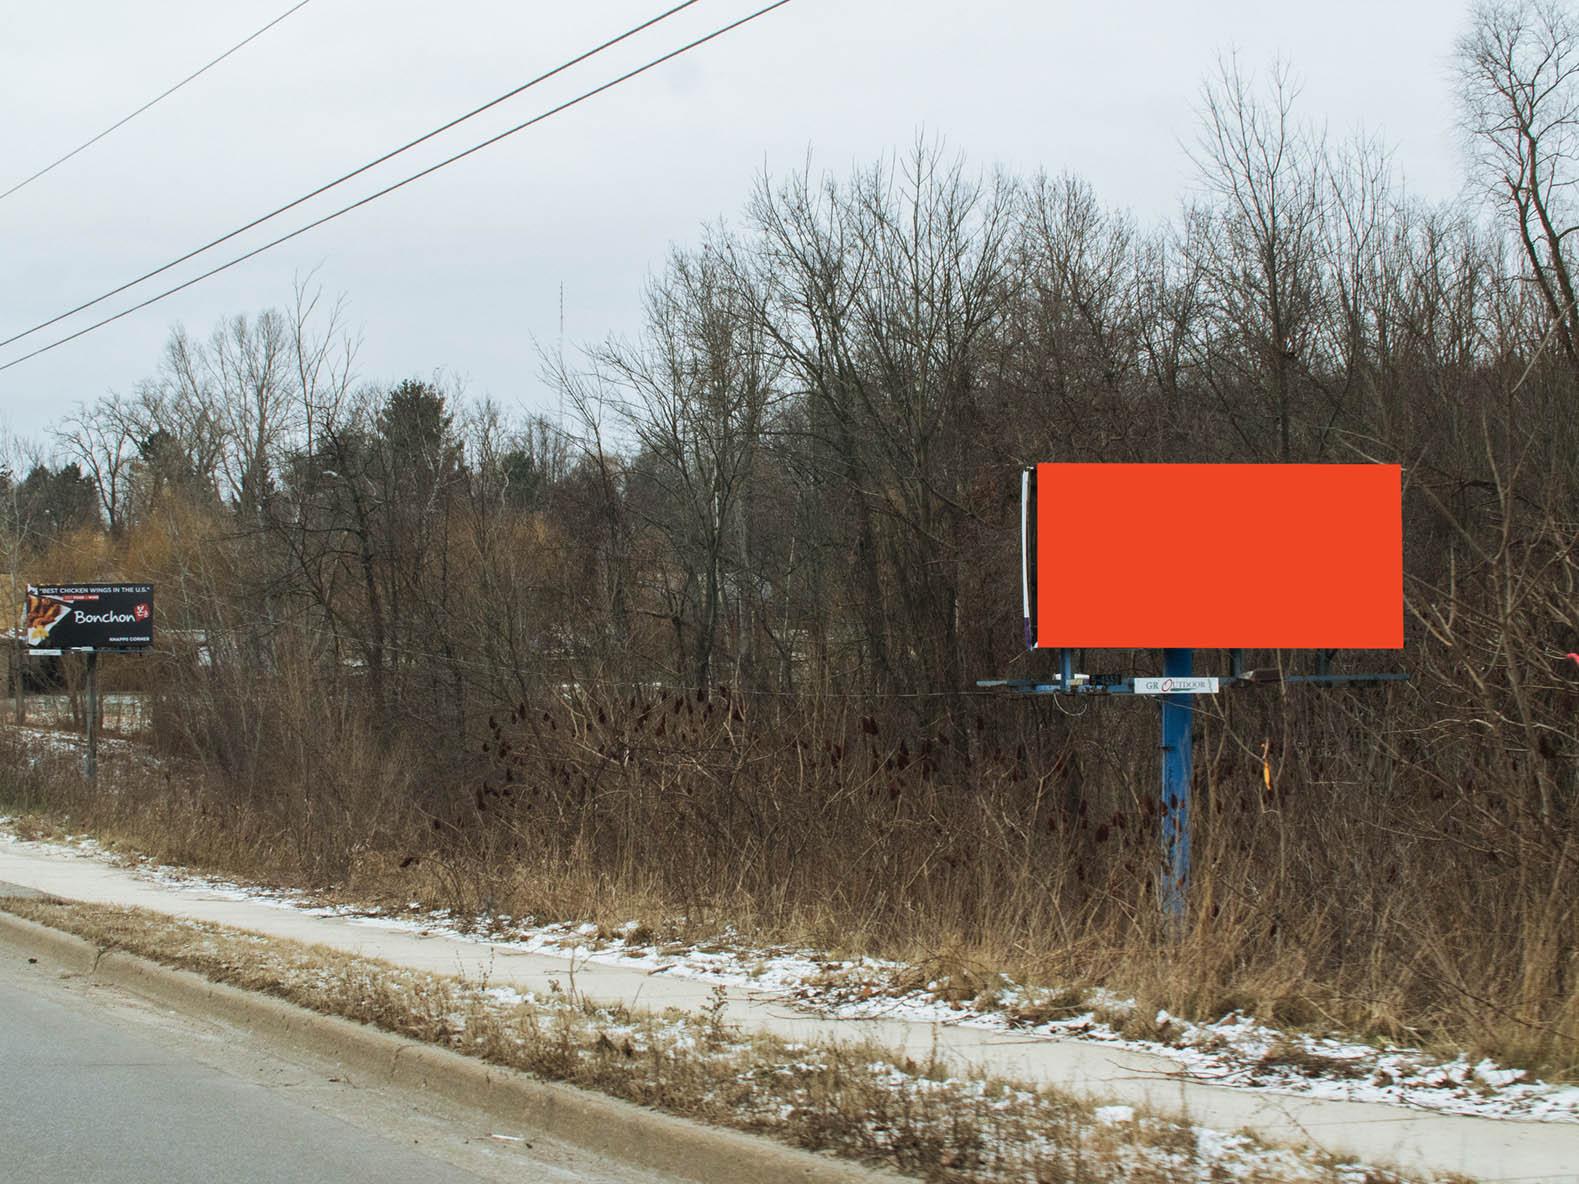 Billboard 417 North (8 x16) - Geopath: 30655503